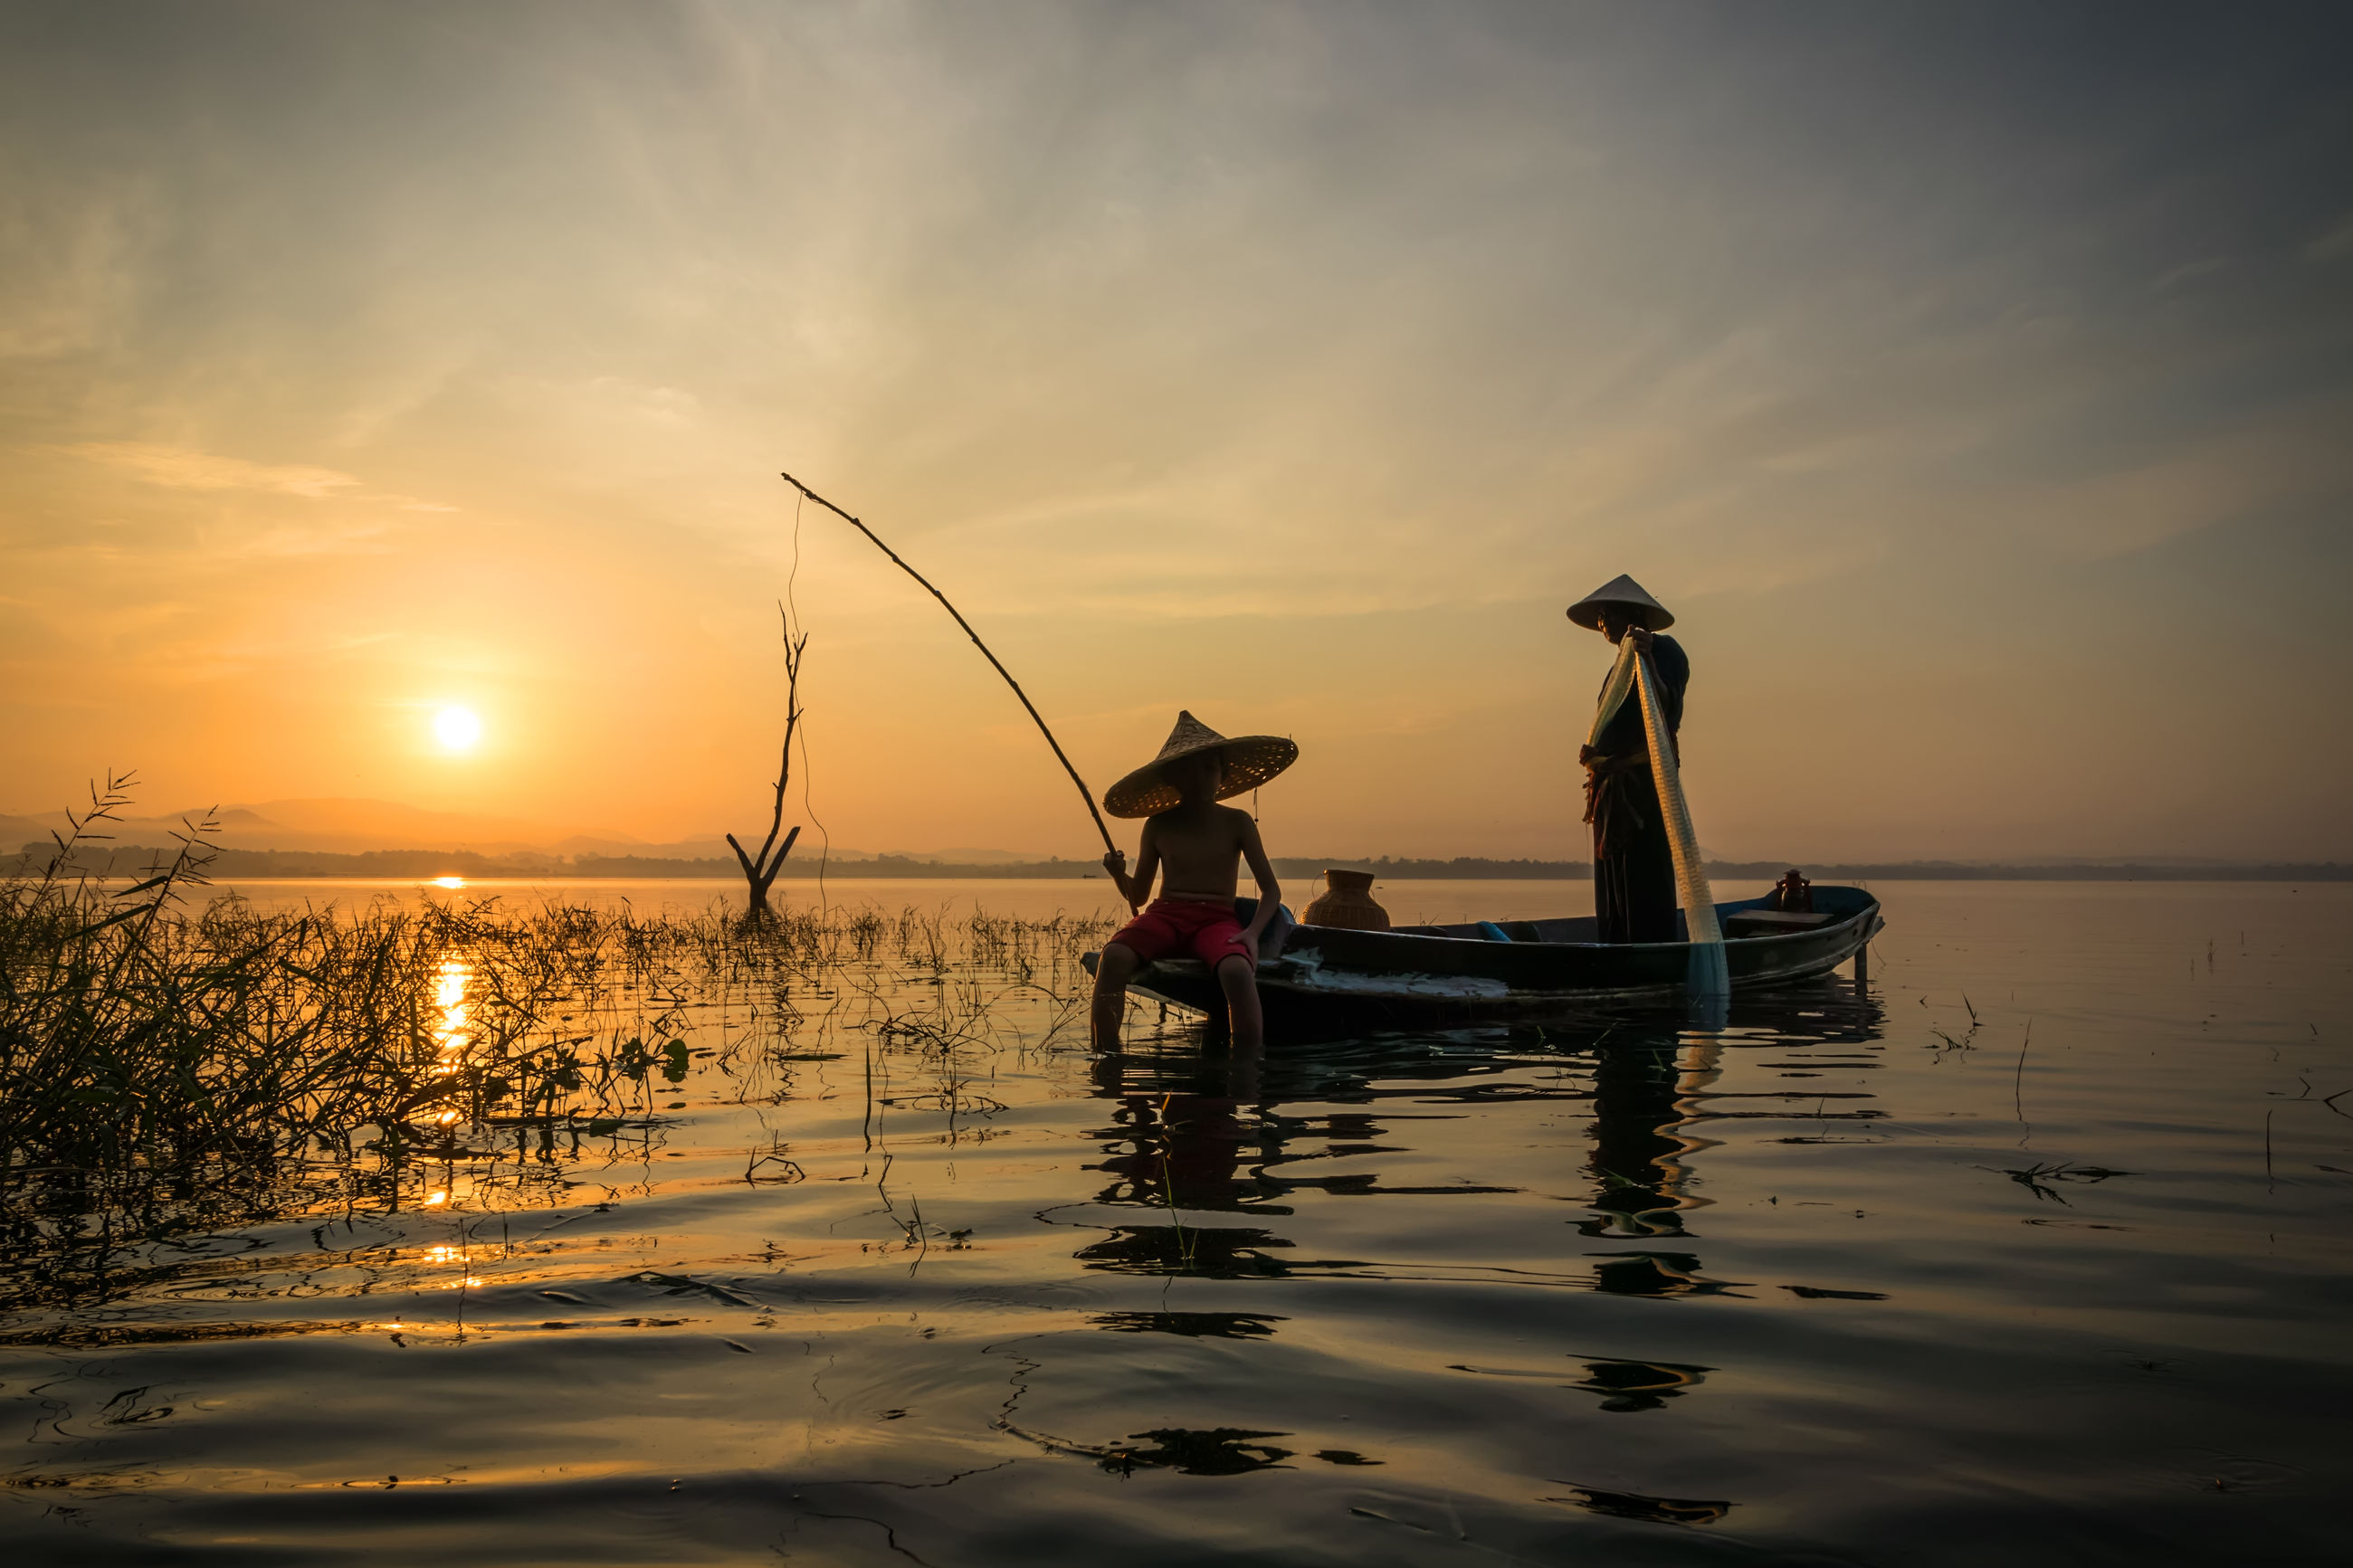 MEN FISHING IN SEA AGAINST SKY AT SUNSET